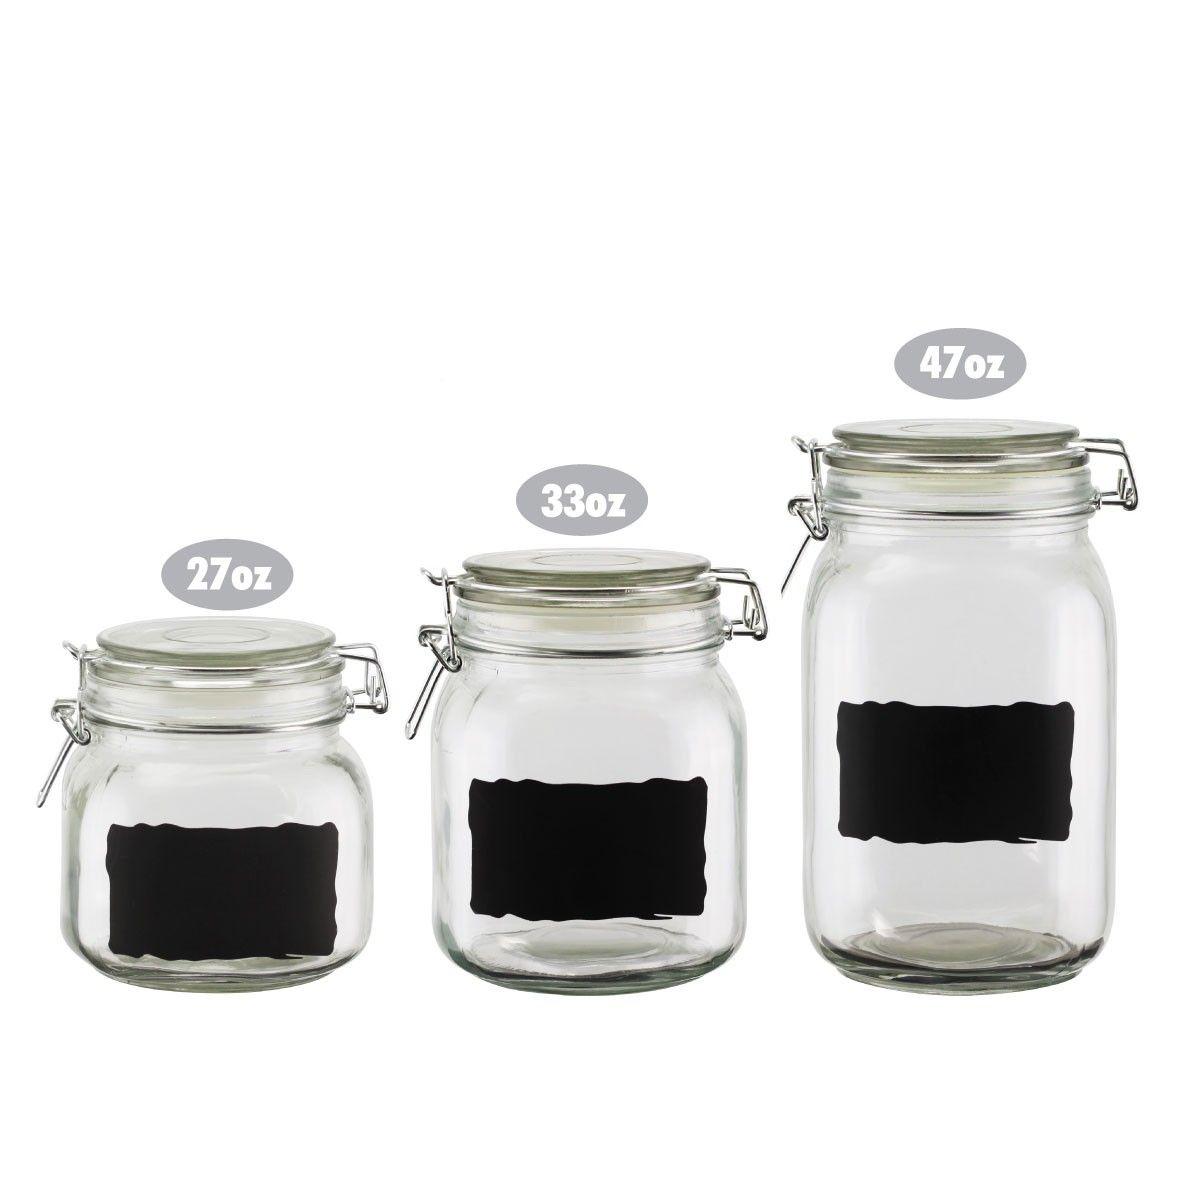 Cucina Vita Chalkboard Label Glass Jar Canister Set of 3, Quality ...